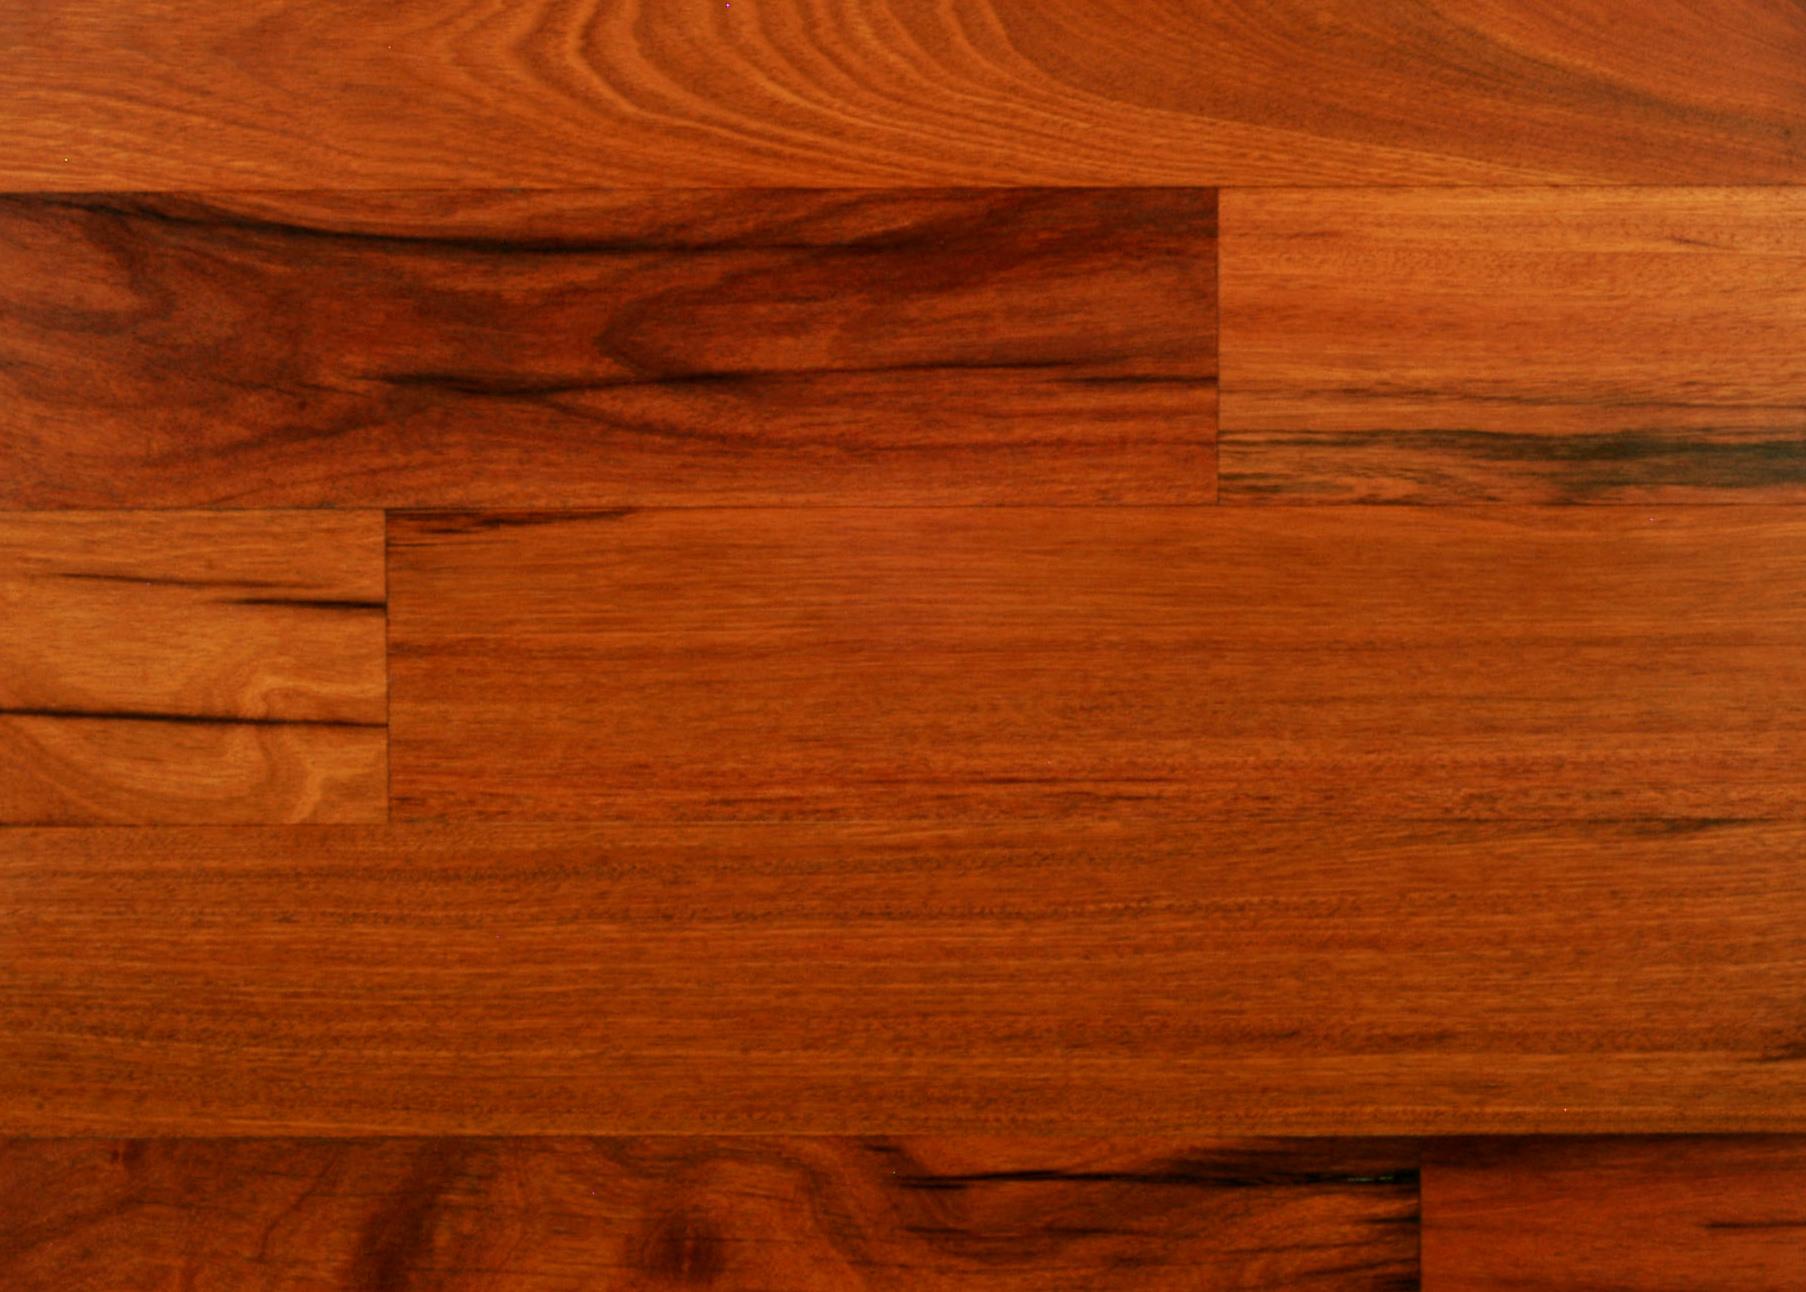 Laminate flooring wilsonart laminate flooring closeout for Wilsonart laminate flooring